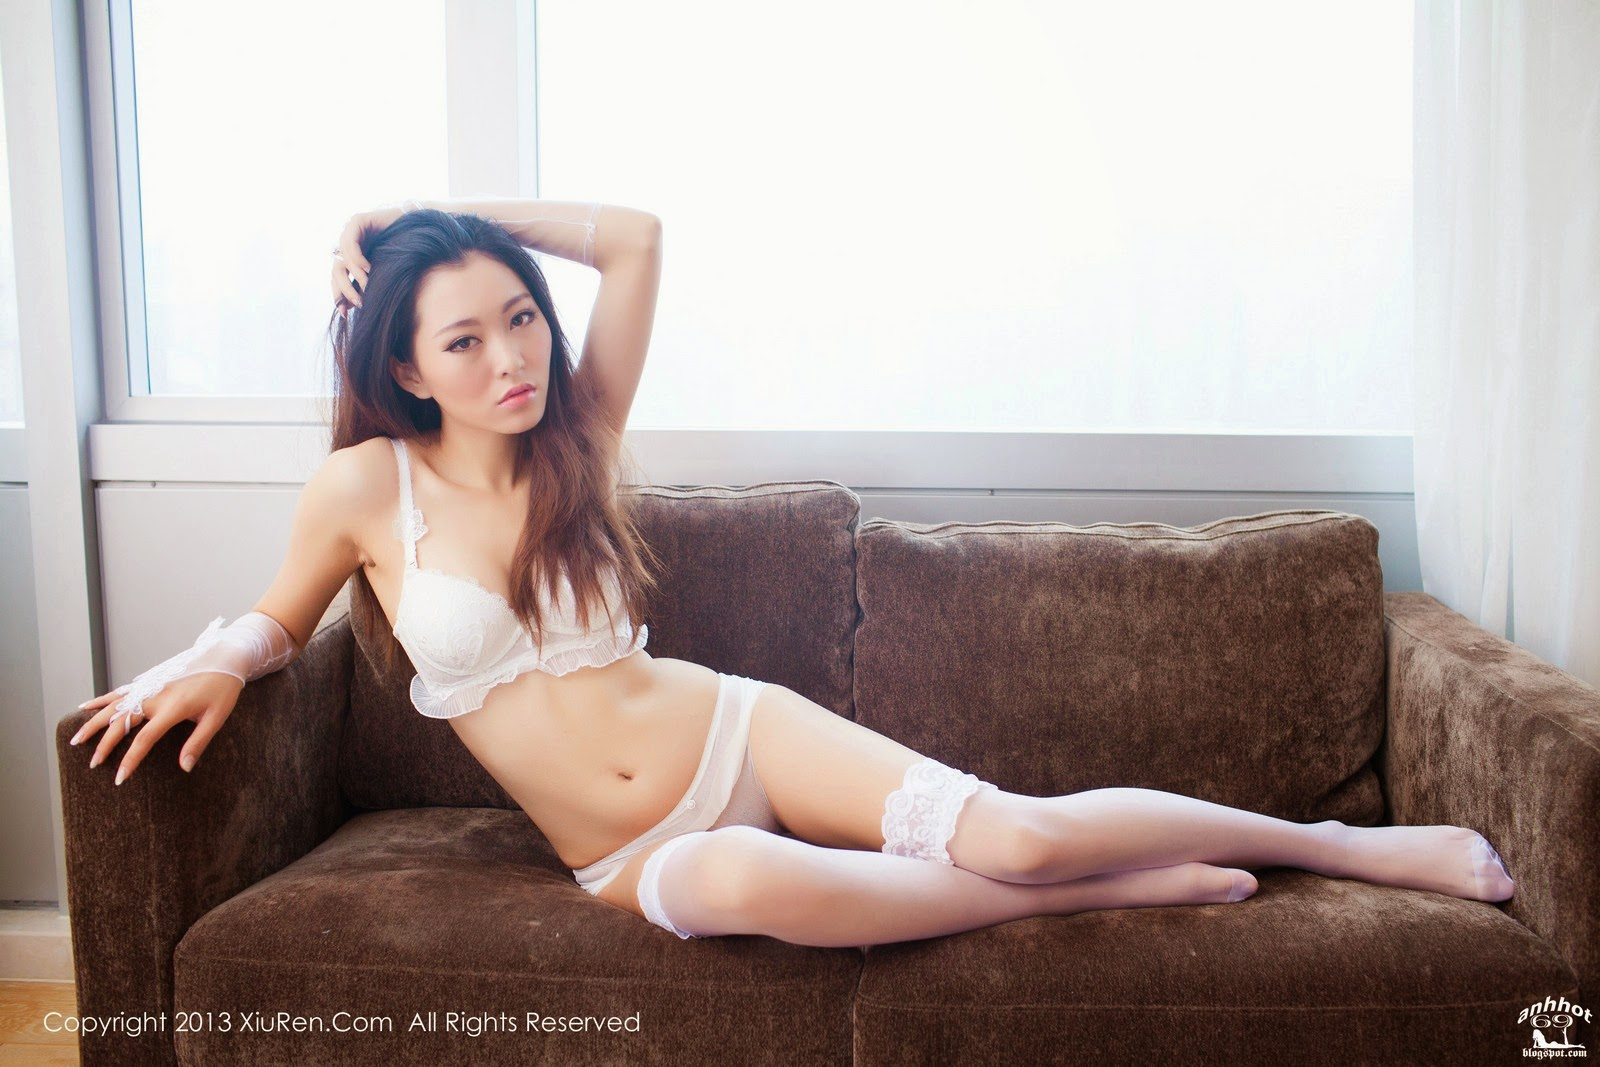 xiuren-xiuren-02491266